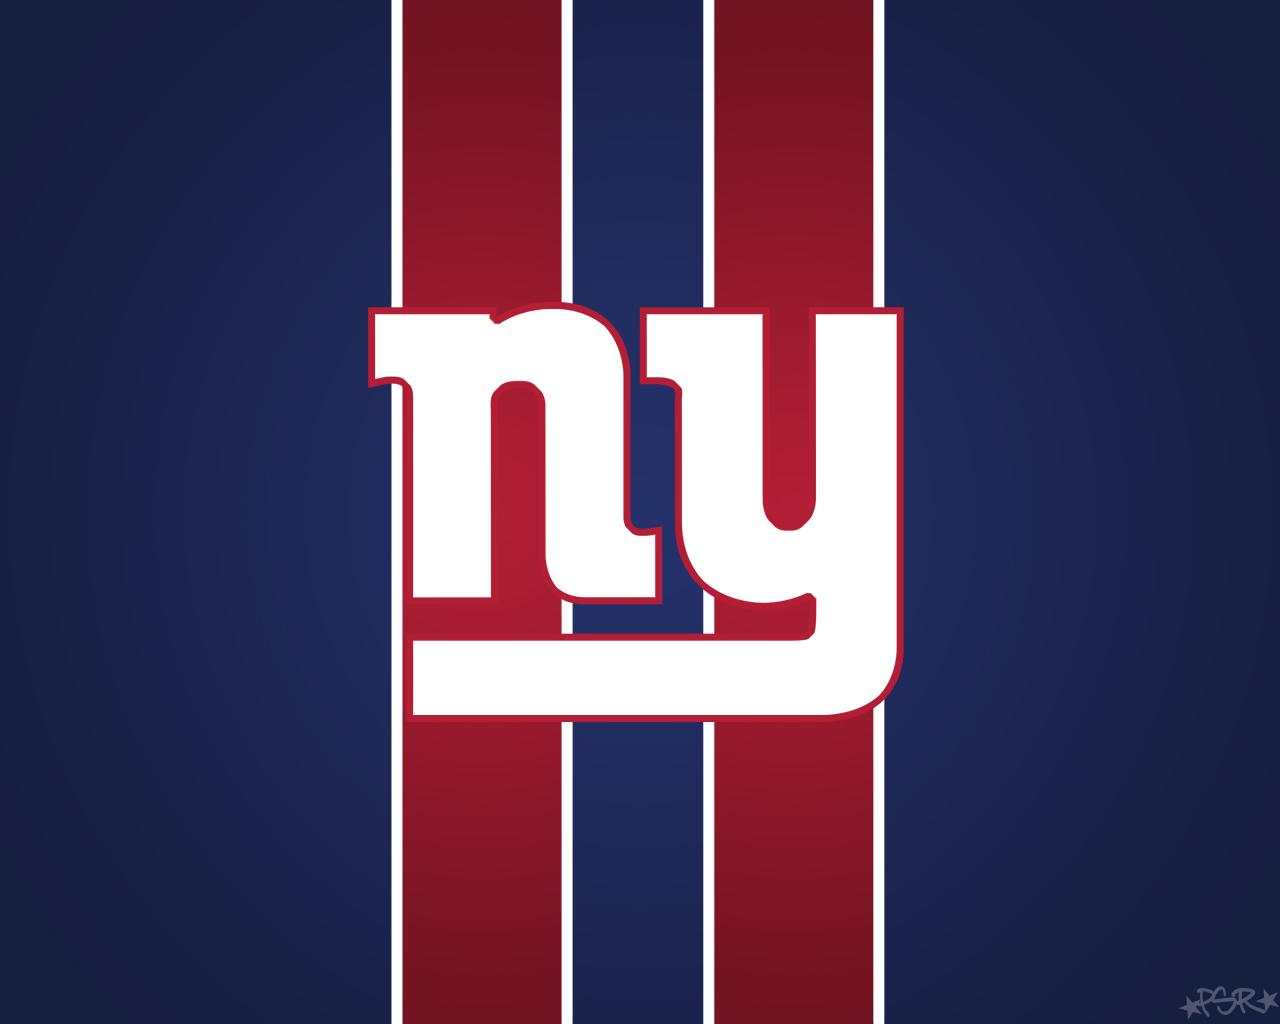 Free Download New York Giants Wallpaper Background New York